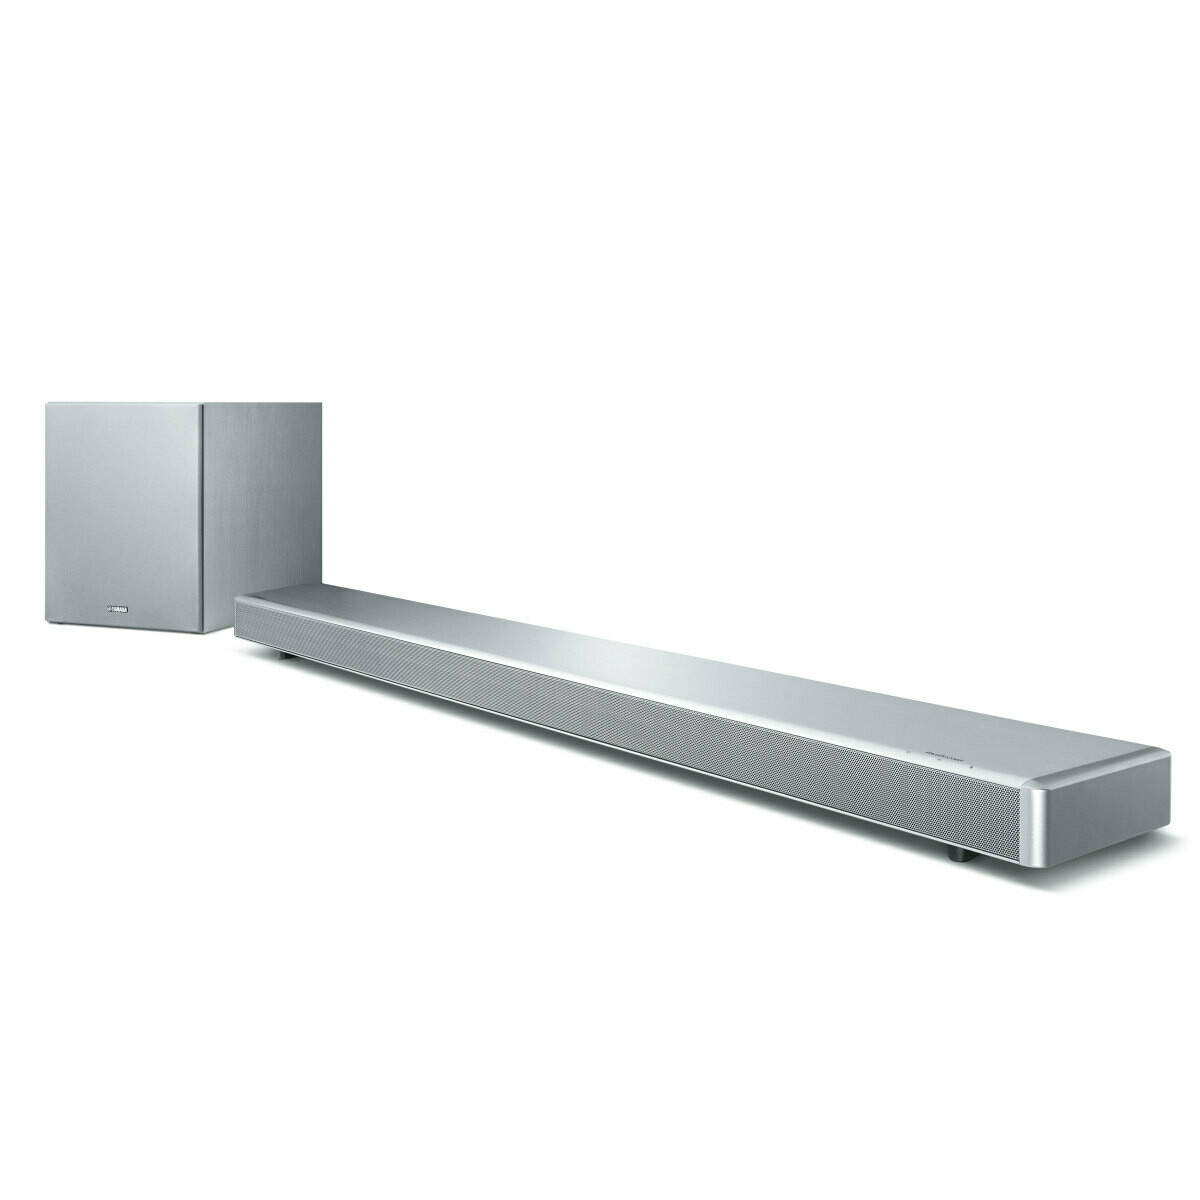 Саундбар YAMAHA YSP-2700 (Silver)